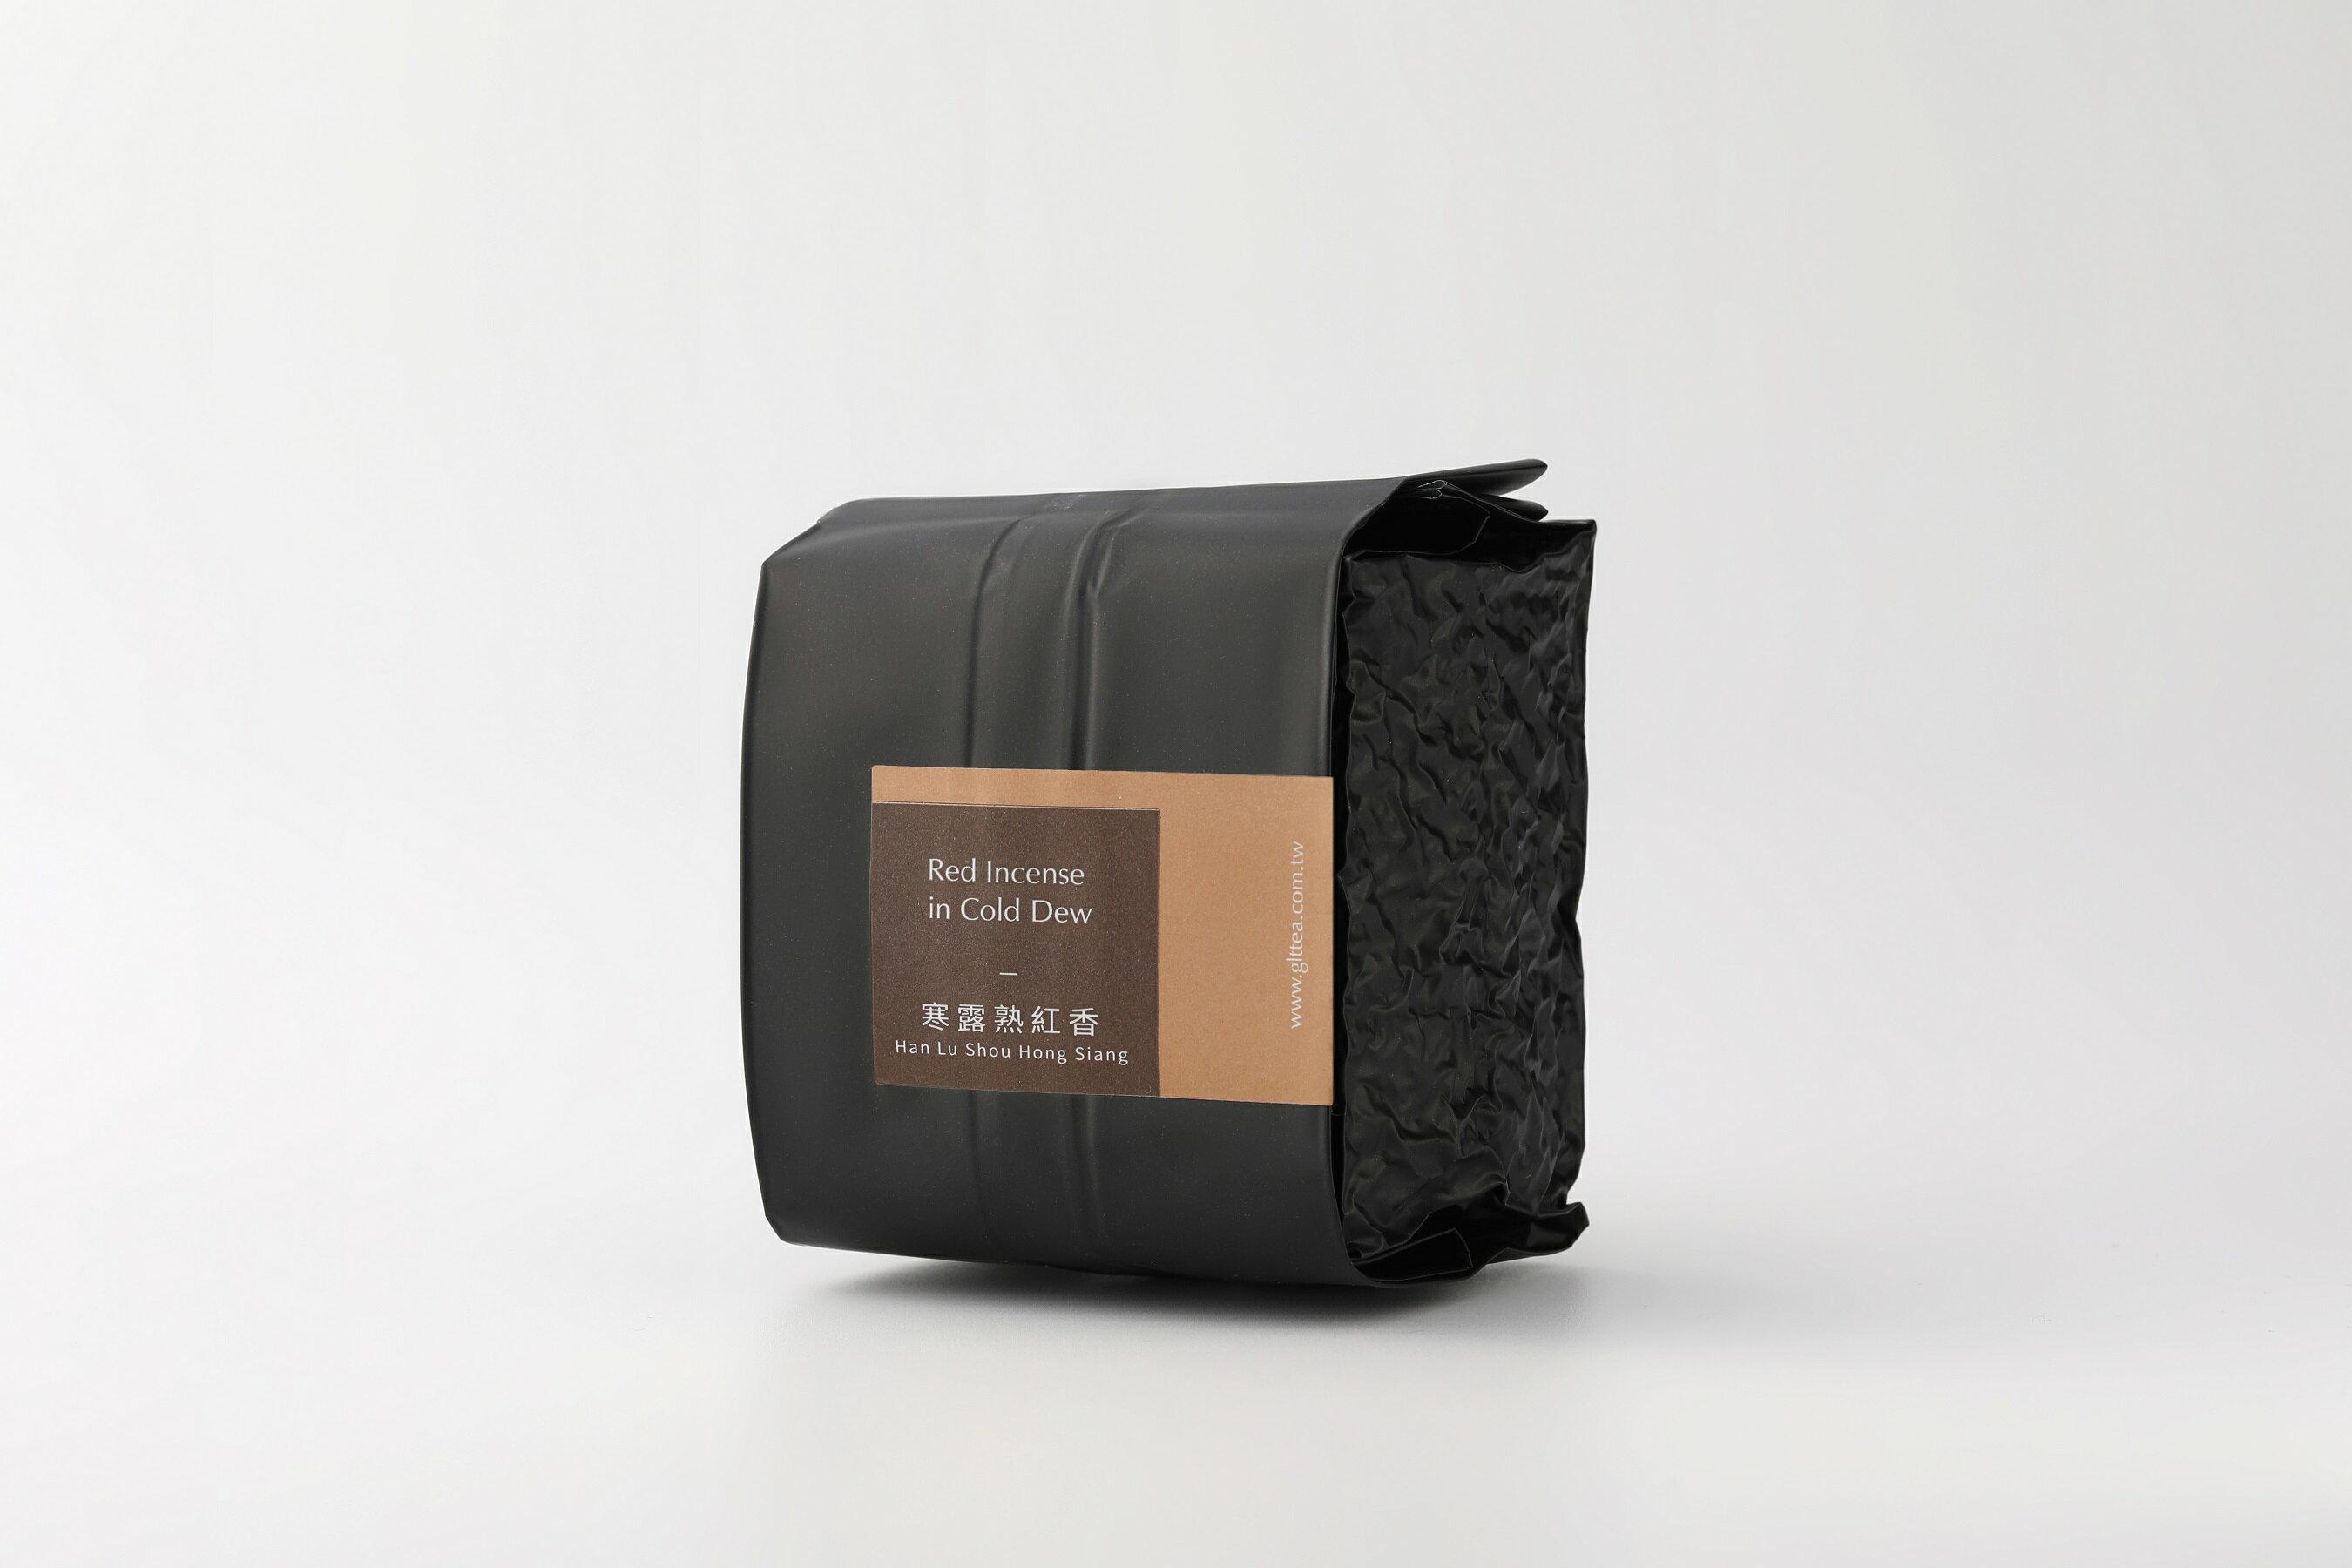 【廿四節氣‧茶葉】寒露熟紅香-杉林溪(100g / 盒)/Han Lu Shou Hong Siang/ Black Tea Aroma in Cold Dew 0